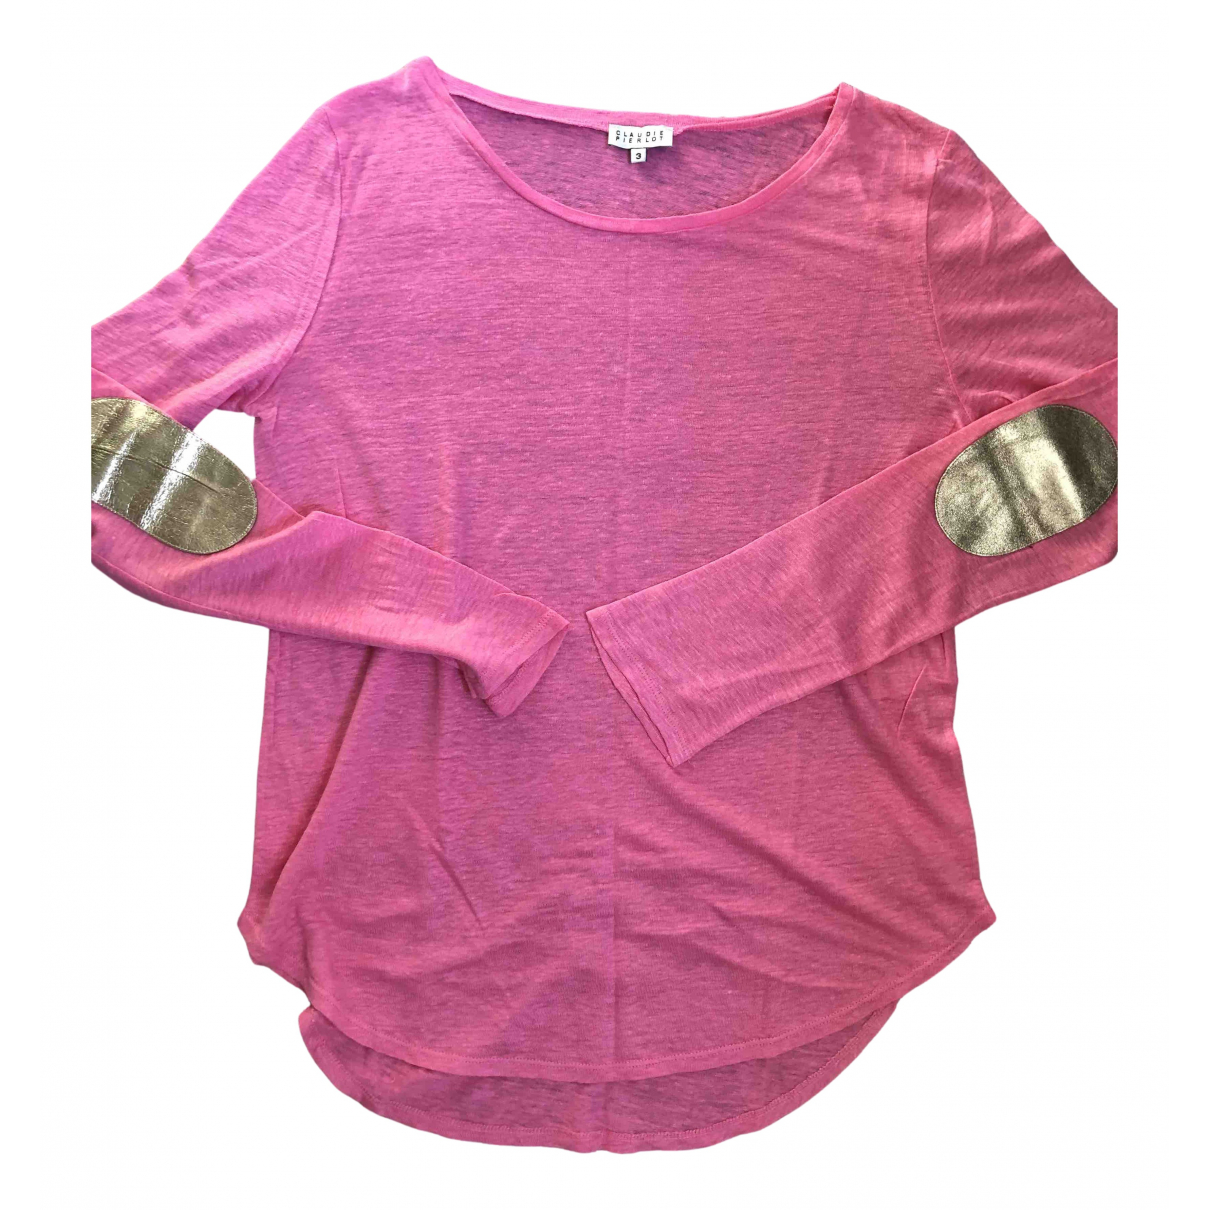 Claudie Pierlot Spring Summer 2019 Pink Linen  top for Women 3 0-5